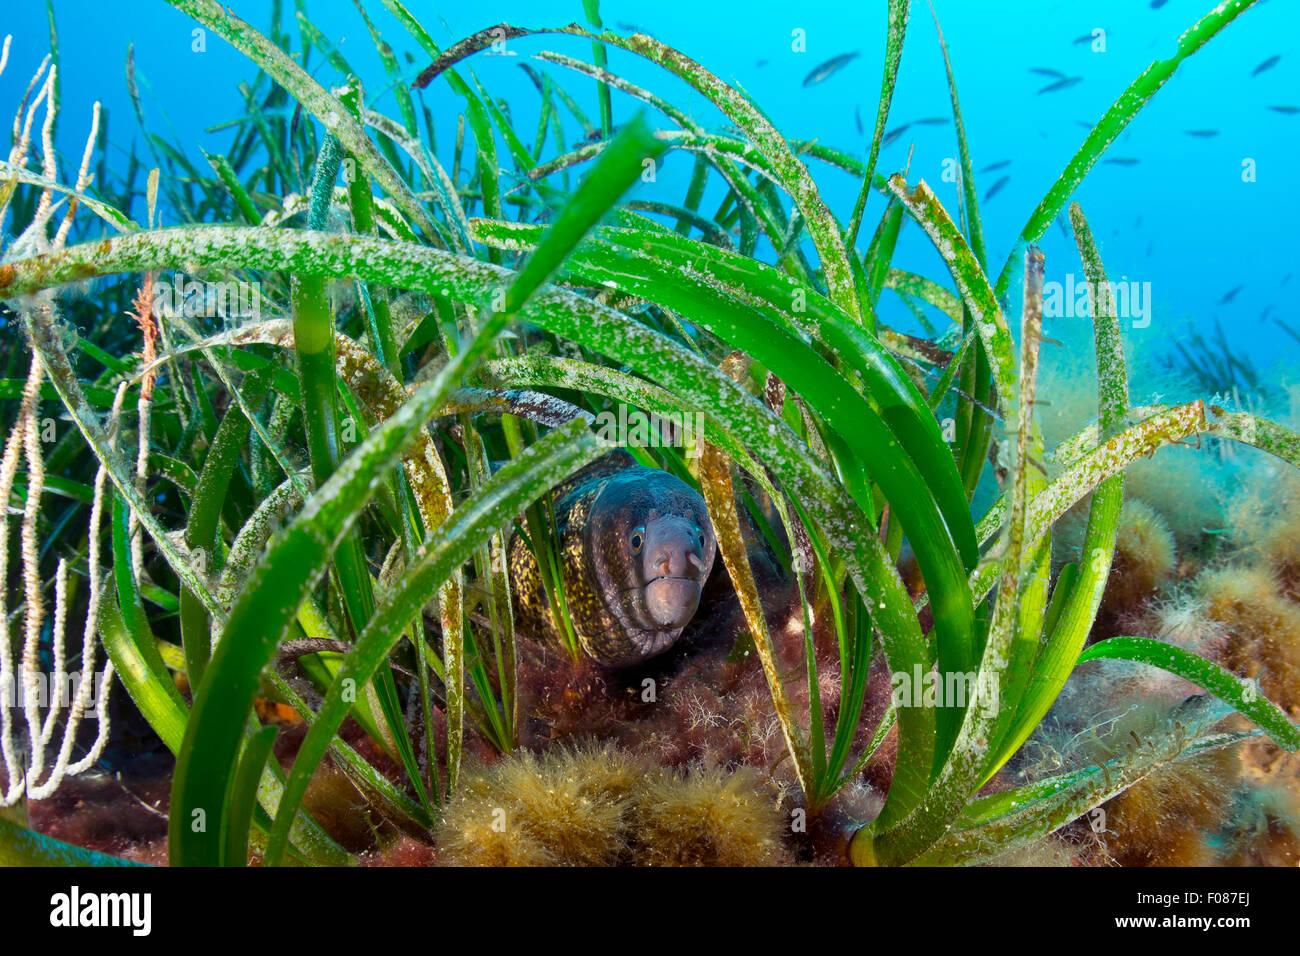 Moray in Seagrass Meadows, Posidonia oceanica, Massa Lubrense, Campania, Italy - Stock Image